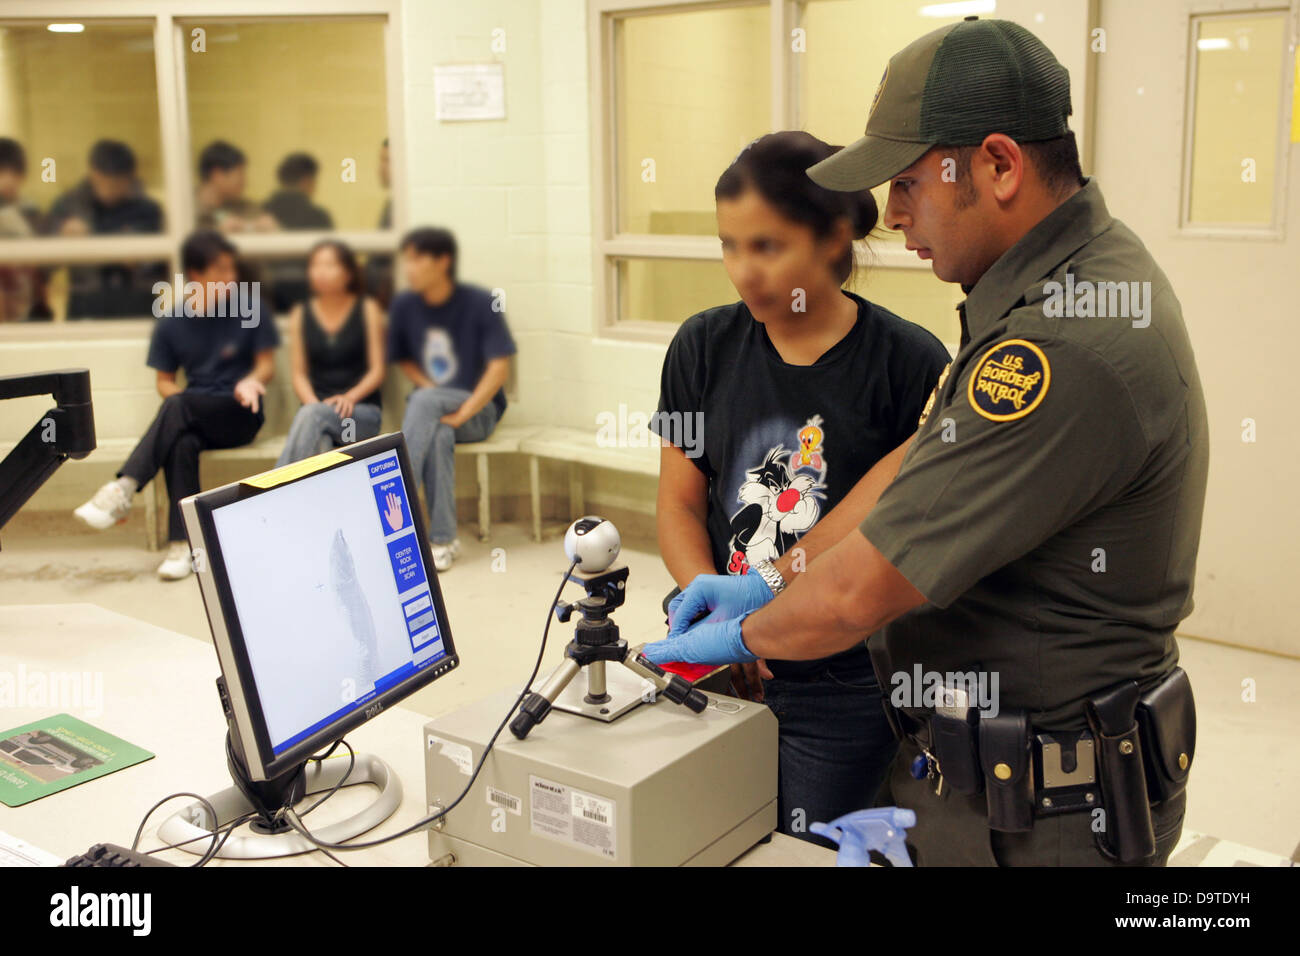 Border Patrol Agent Finger Prints Illegal Alien. - Stock Image